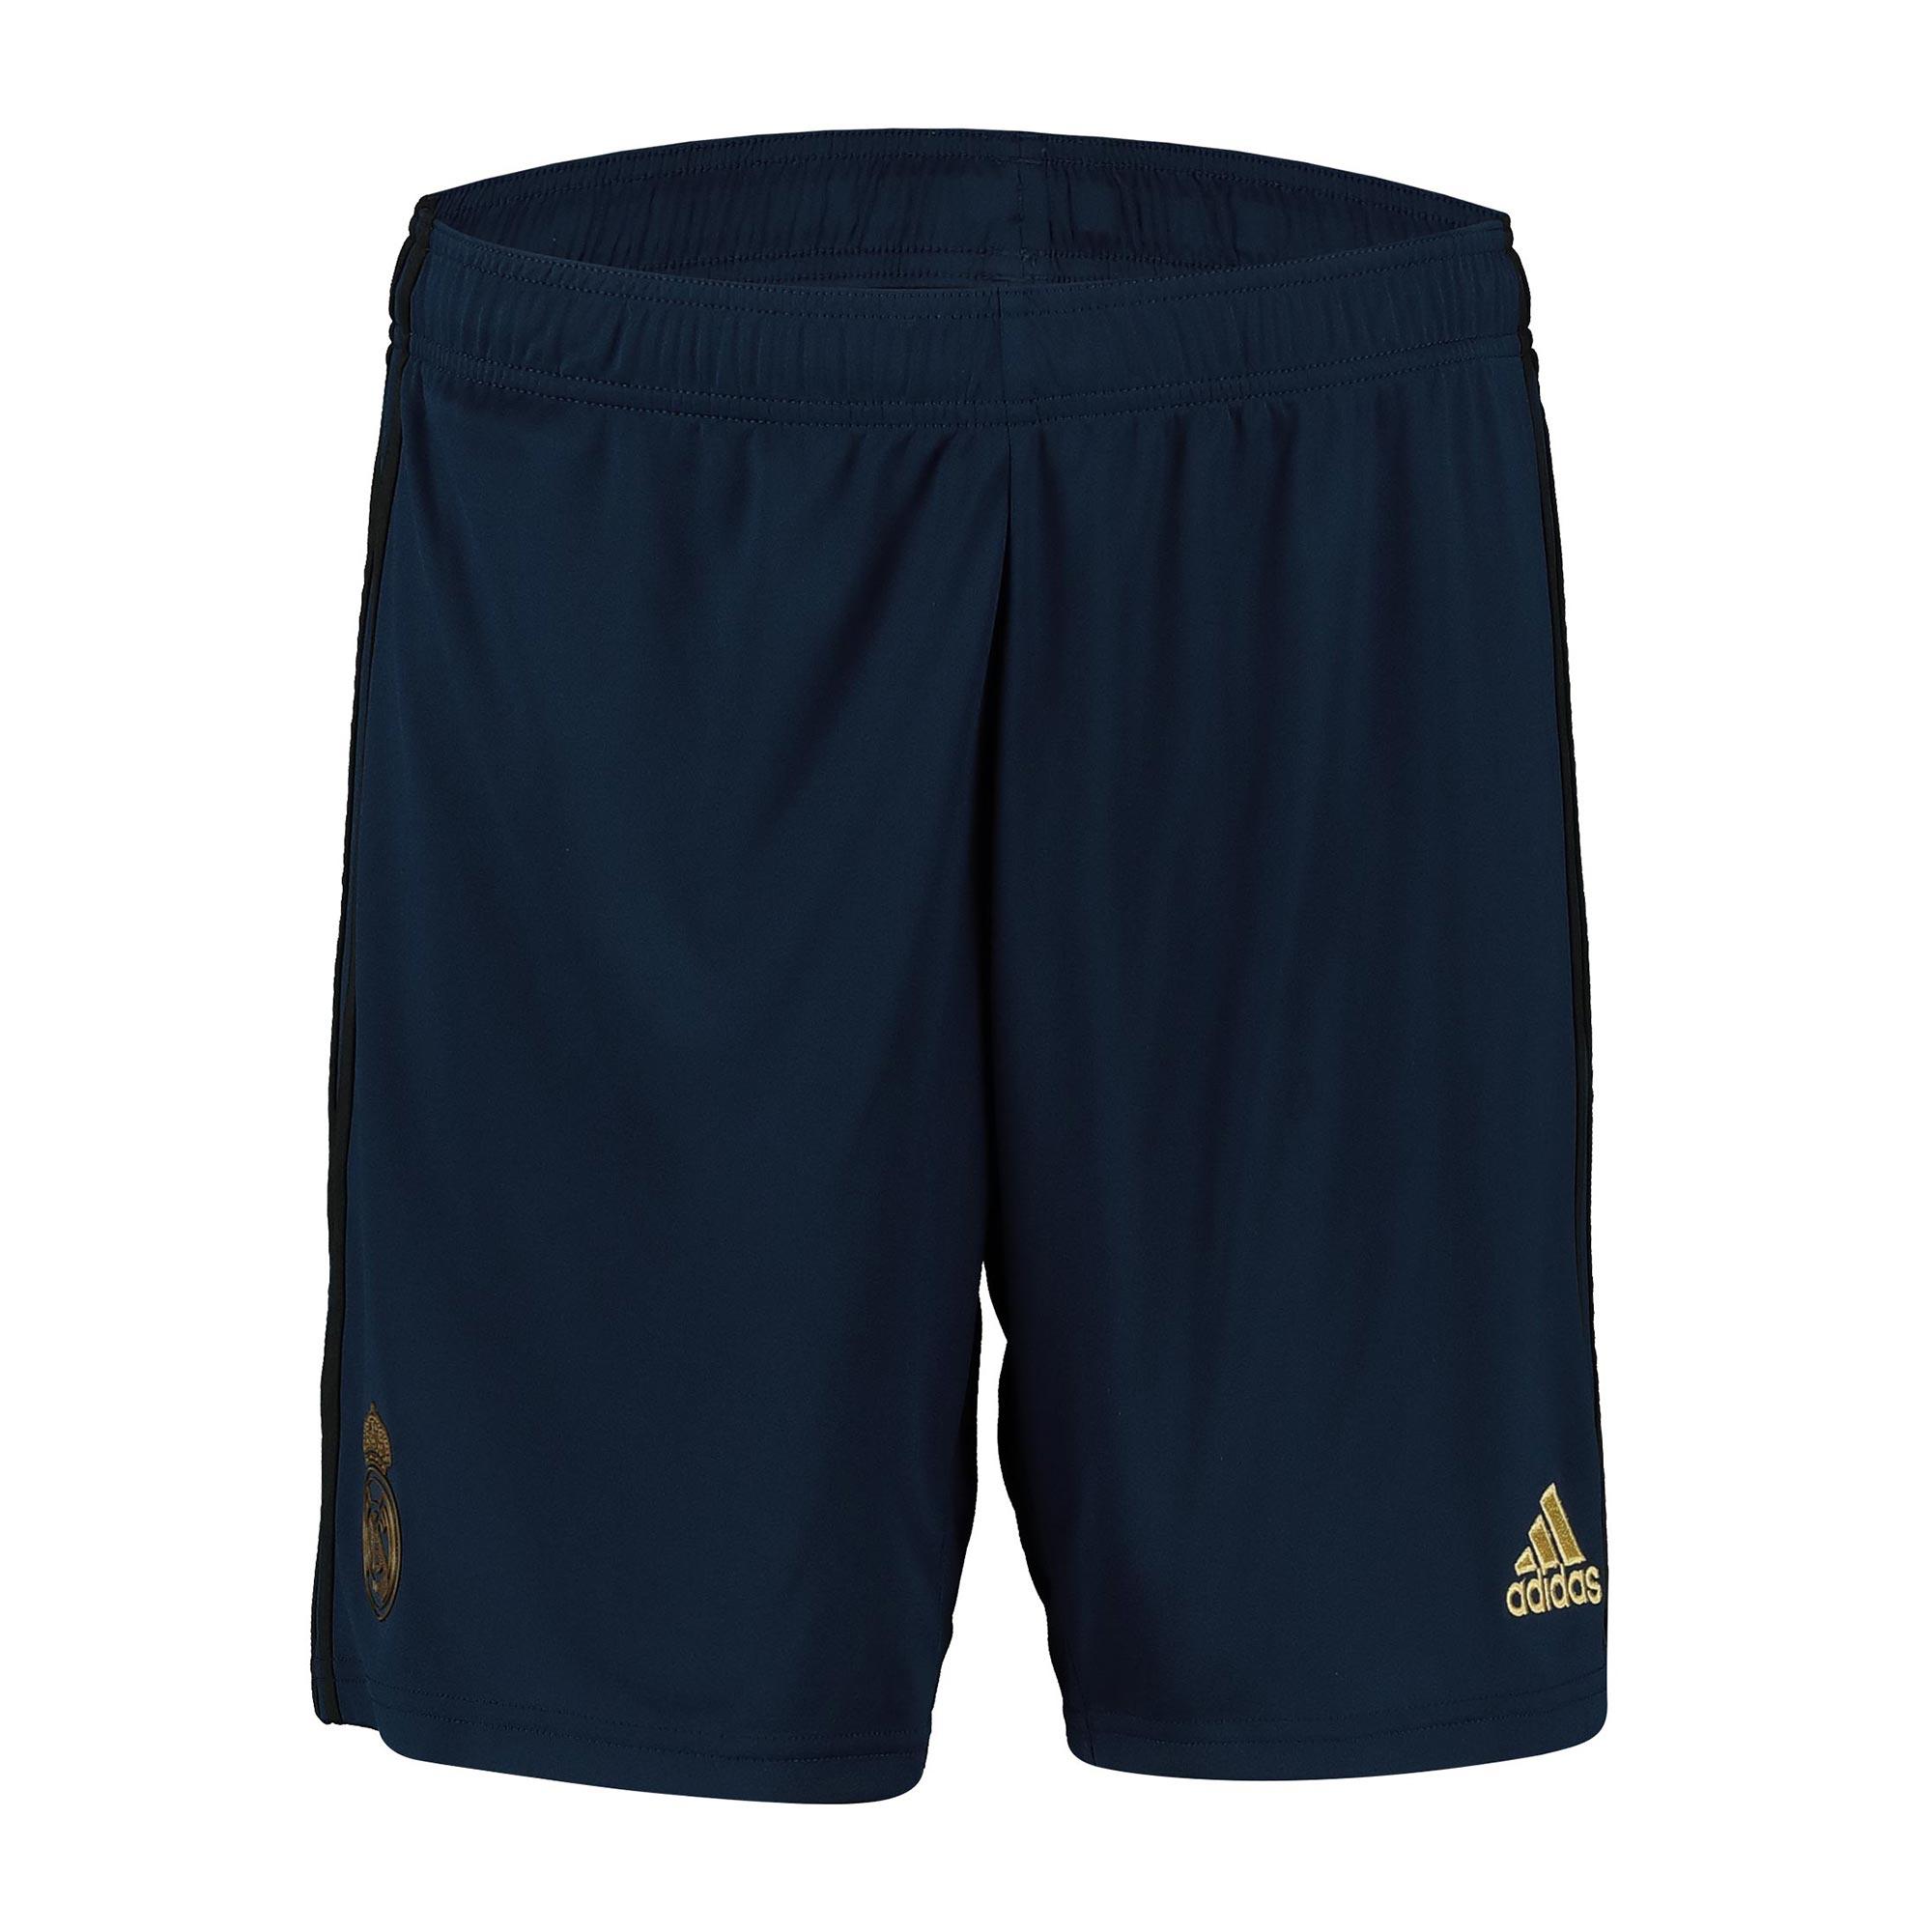 Real Madrid Away Shorts 2019 - 20 - Kids